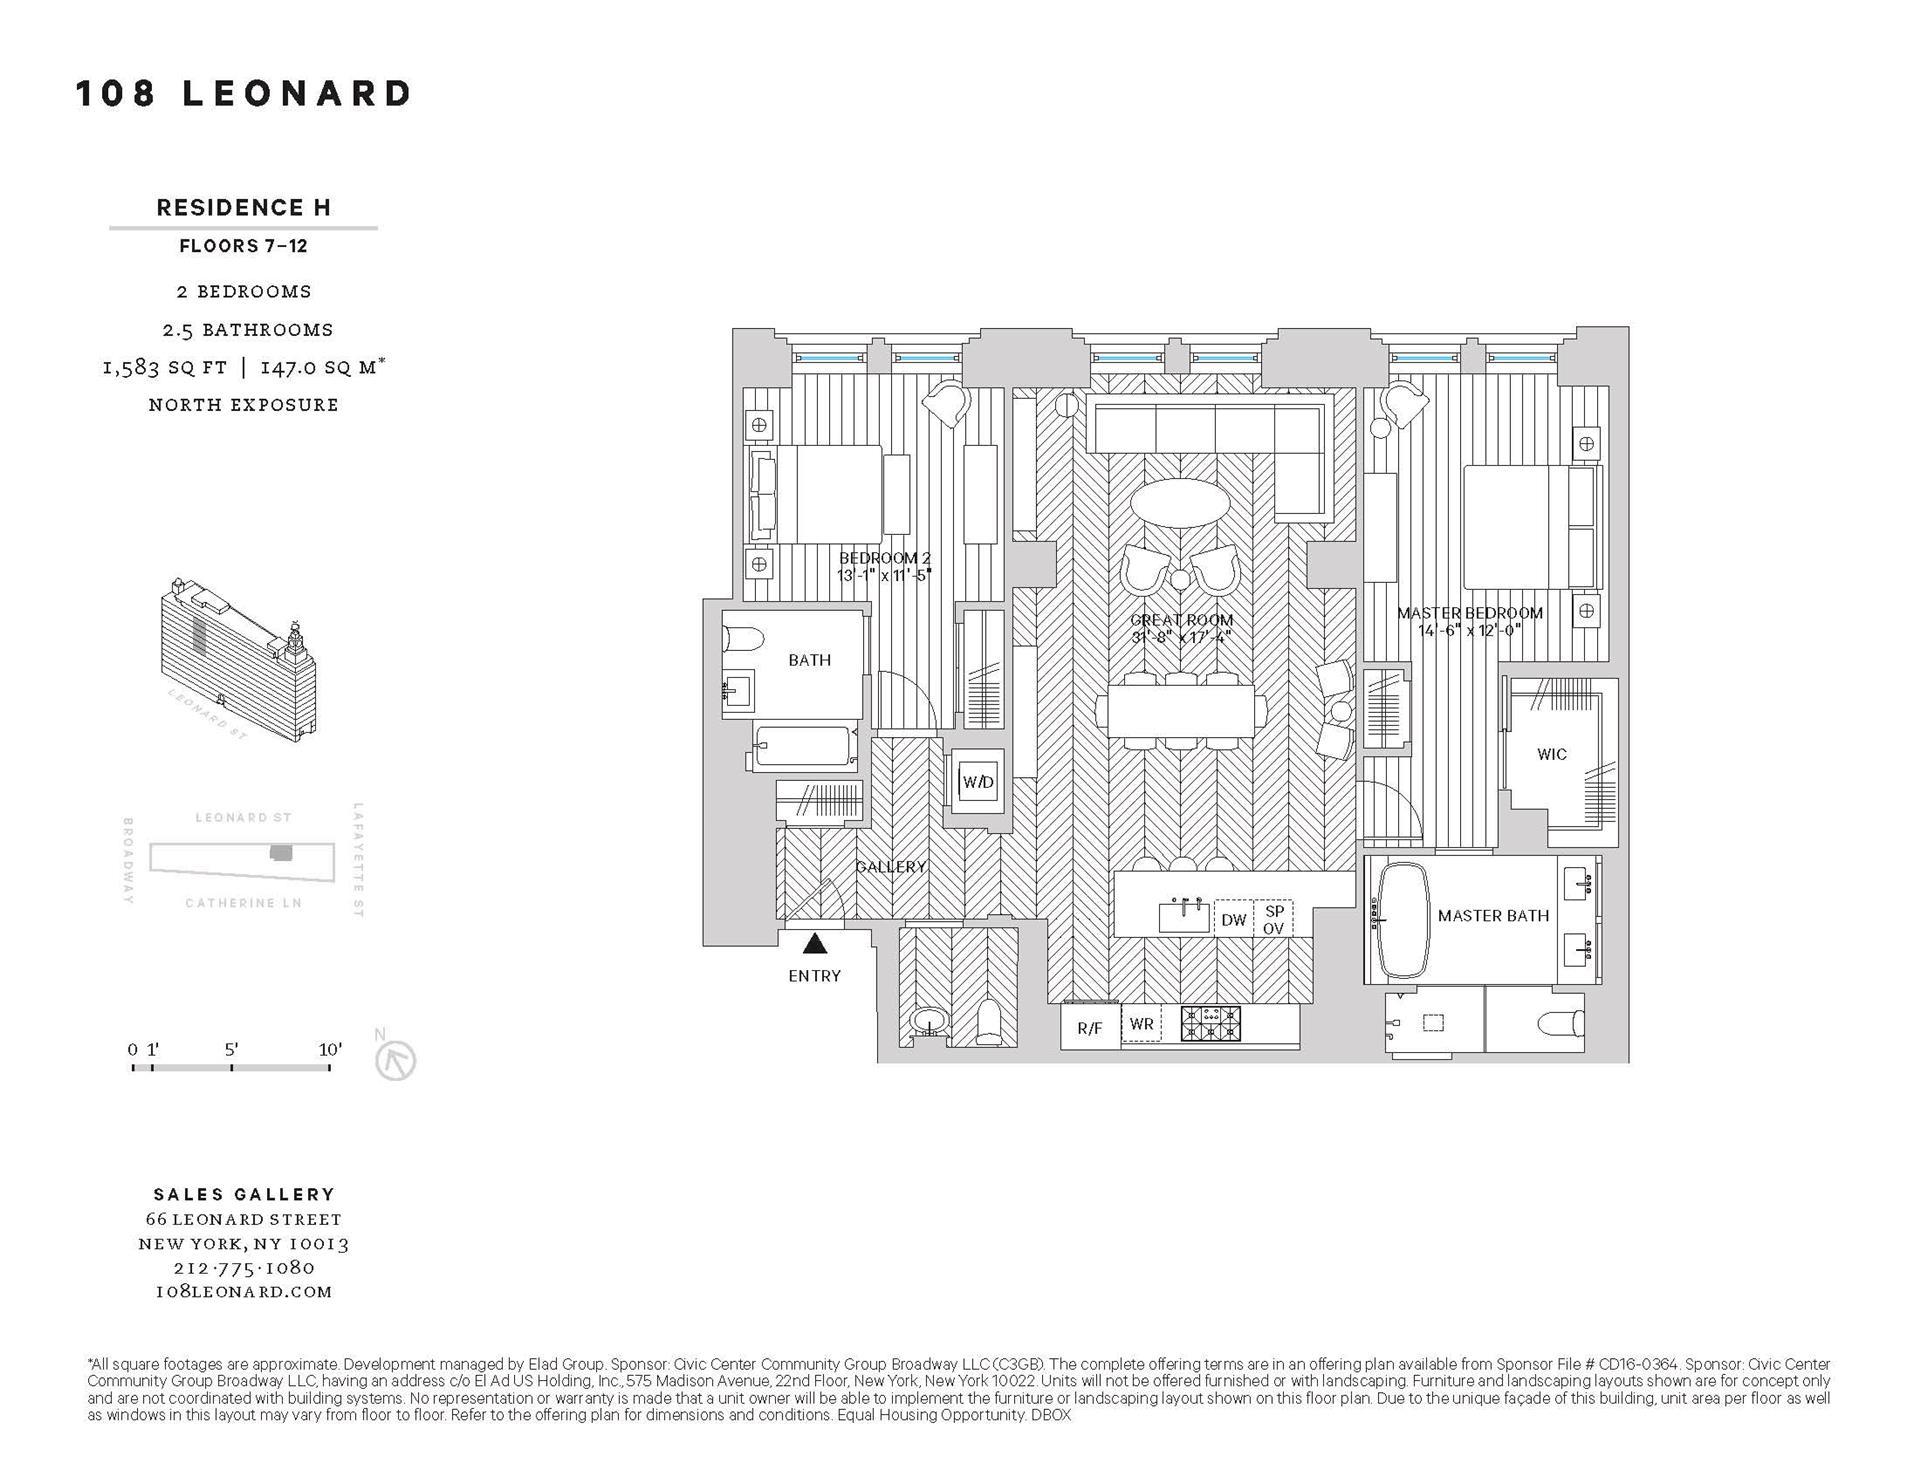 Floor plan of 108 Leonard St, 7H - TriBeCa, New York